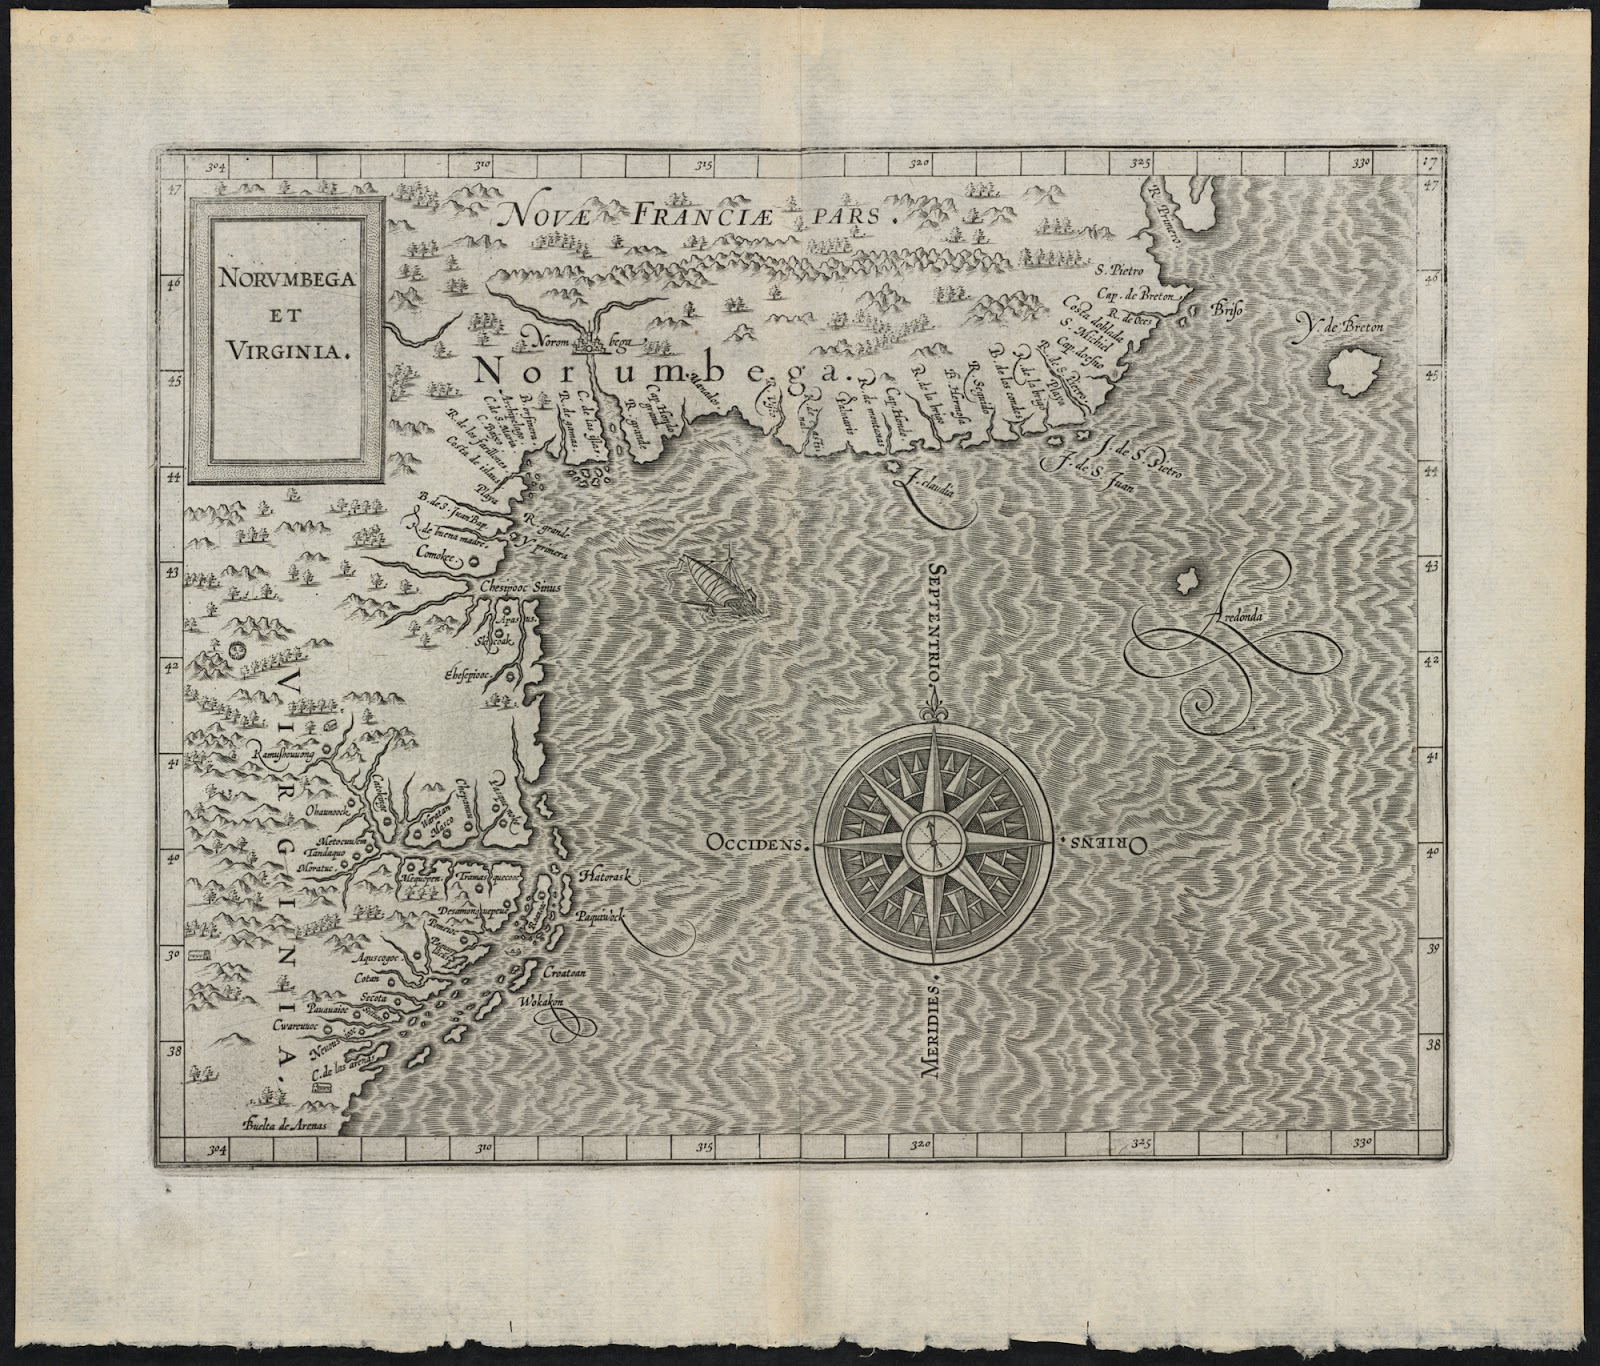 https://upload.wikimedia.org/wikipedia/commons/4/4b/Norumbega_et_Virginia_(2675736680).jpg